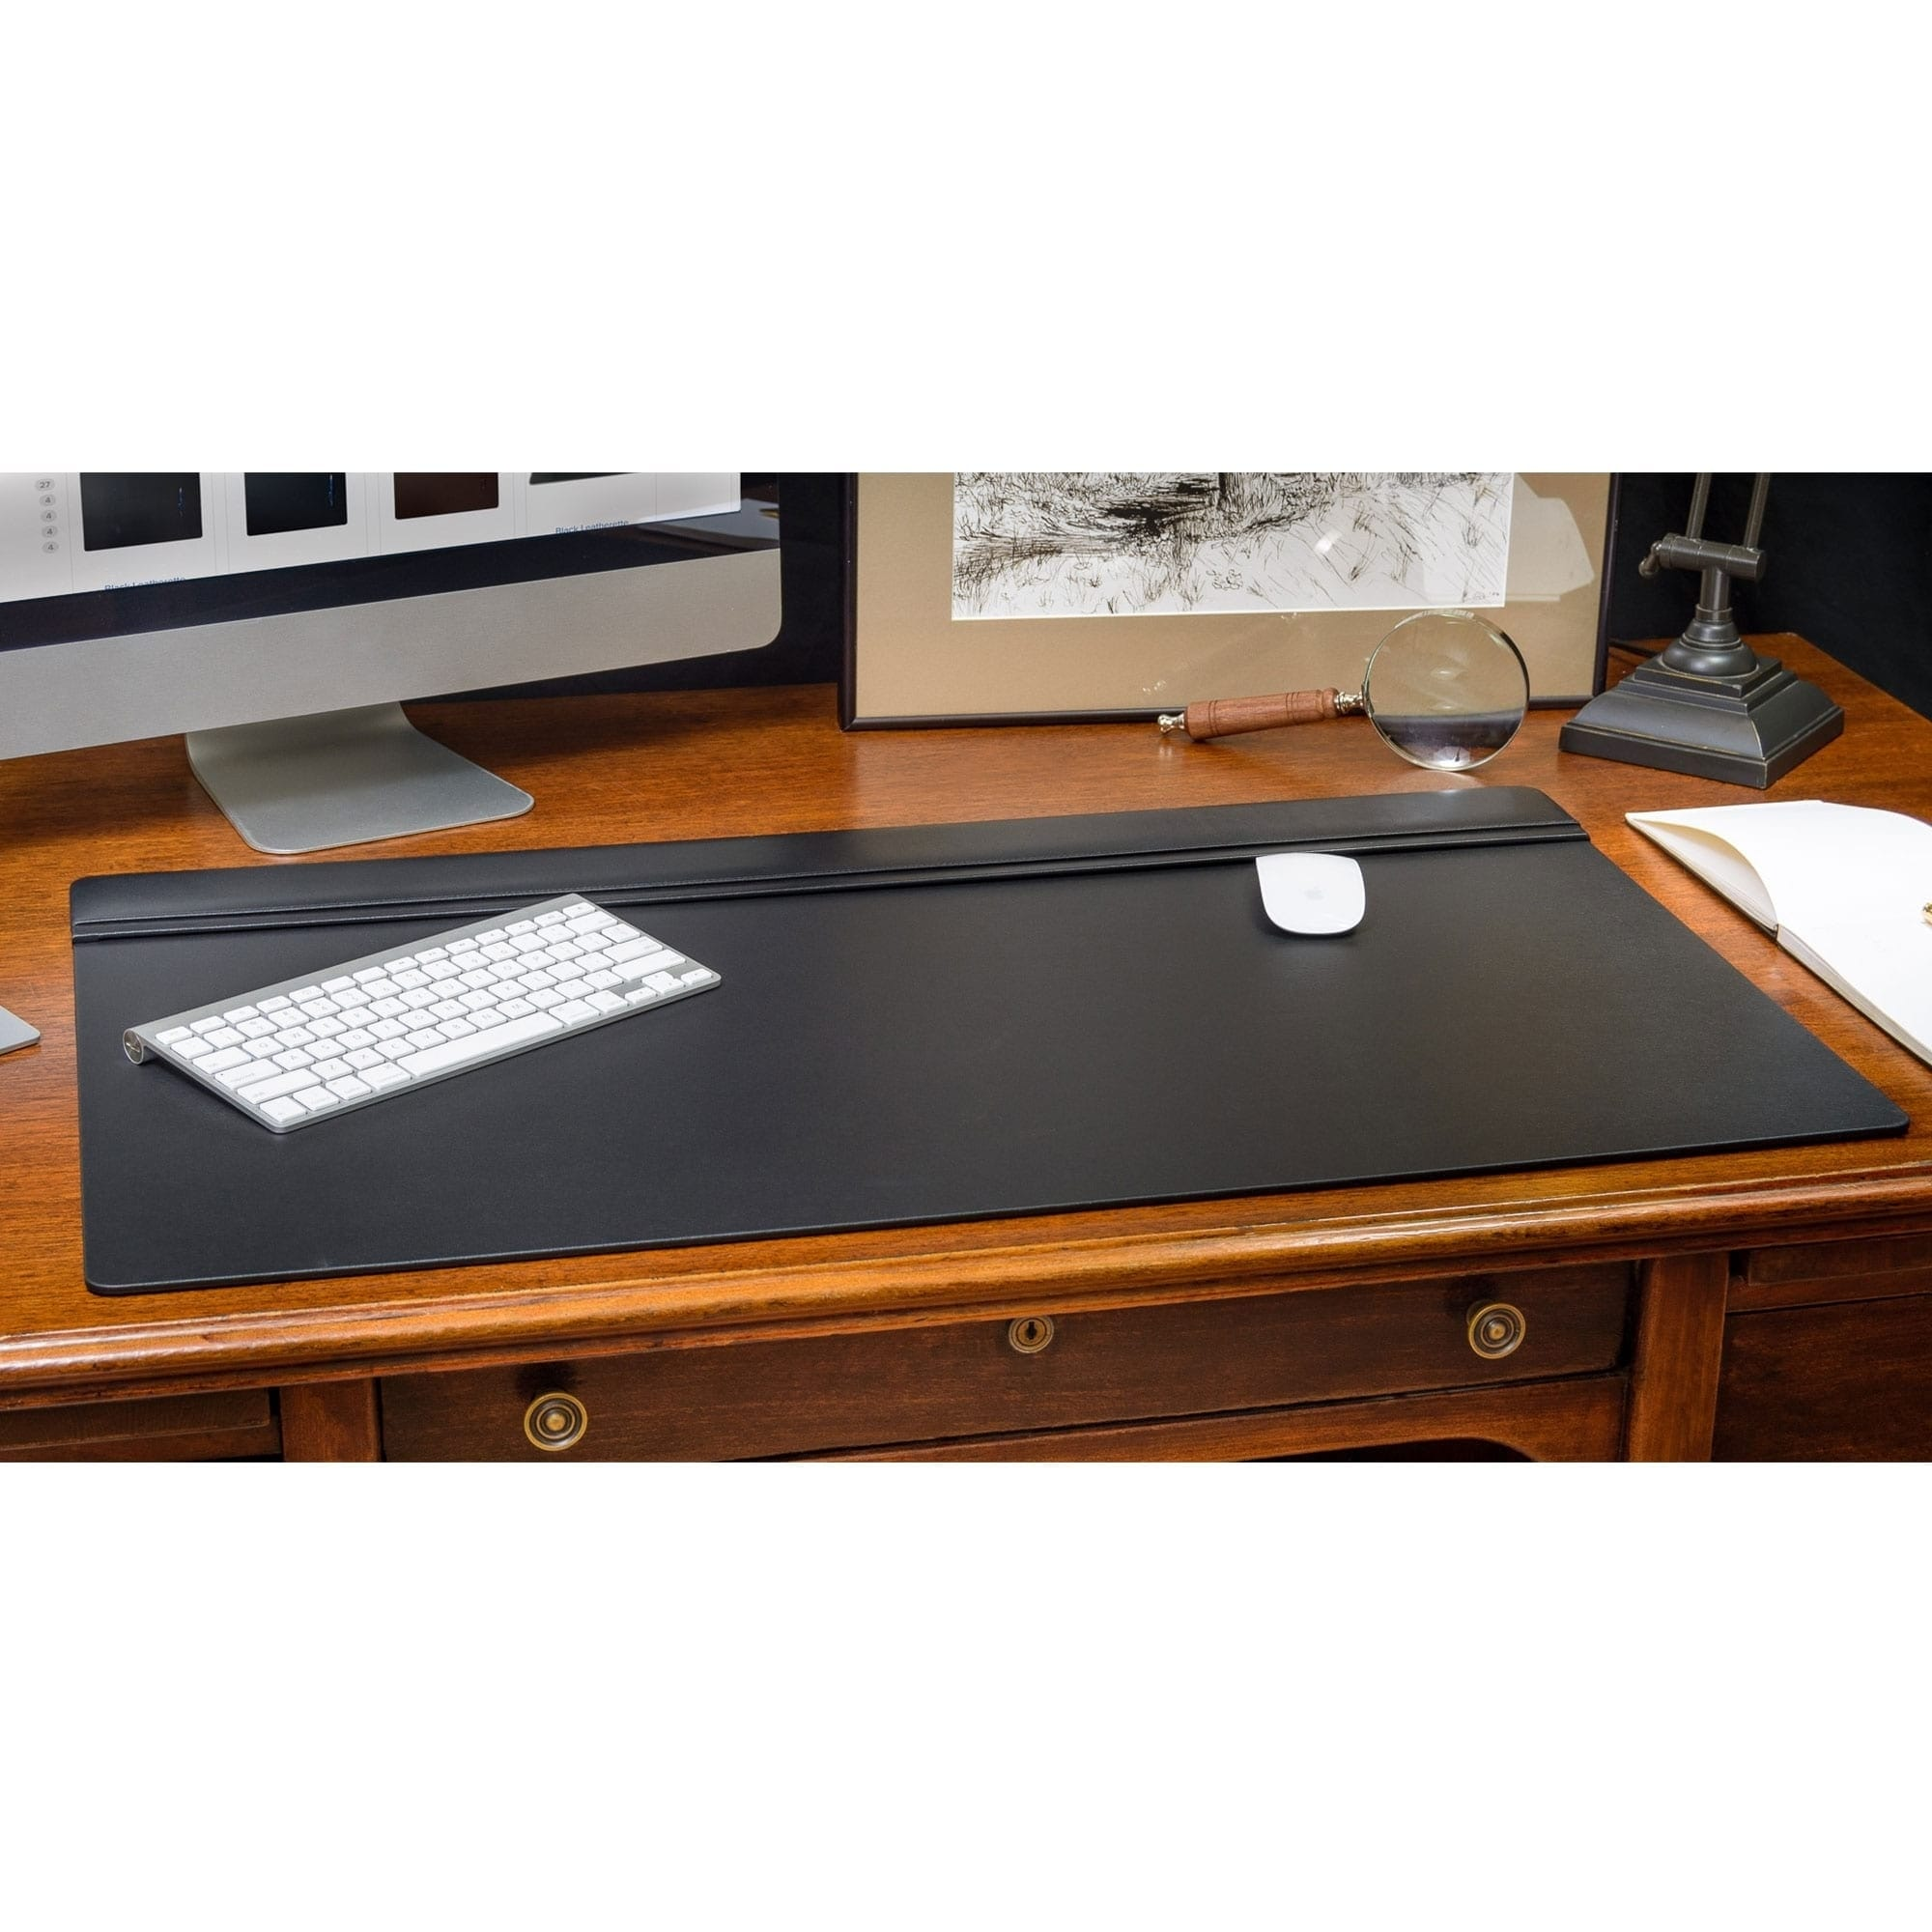 Dacasso Leather 34 X 20 Inch Top Rail Desk Pad 34 X 20 34 X 20 Overstock 4371006